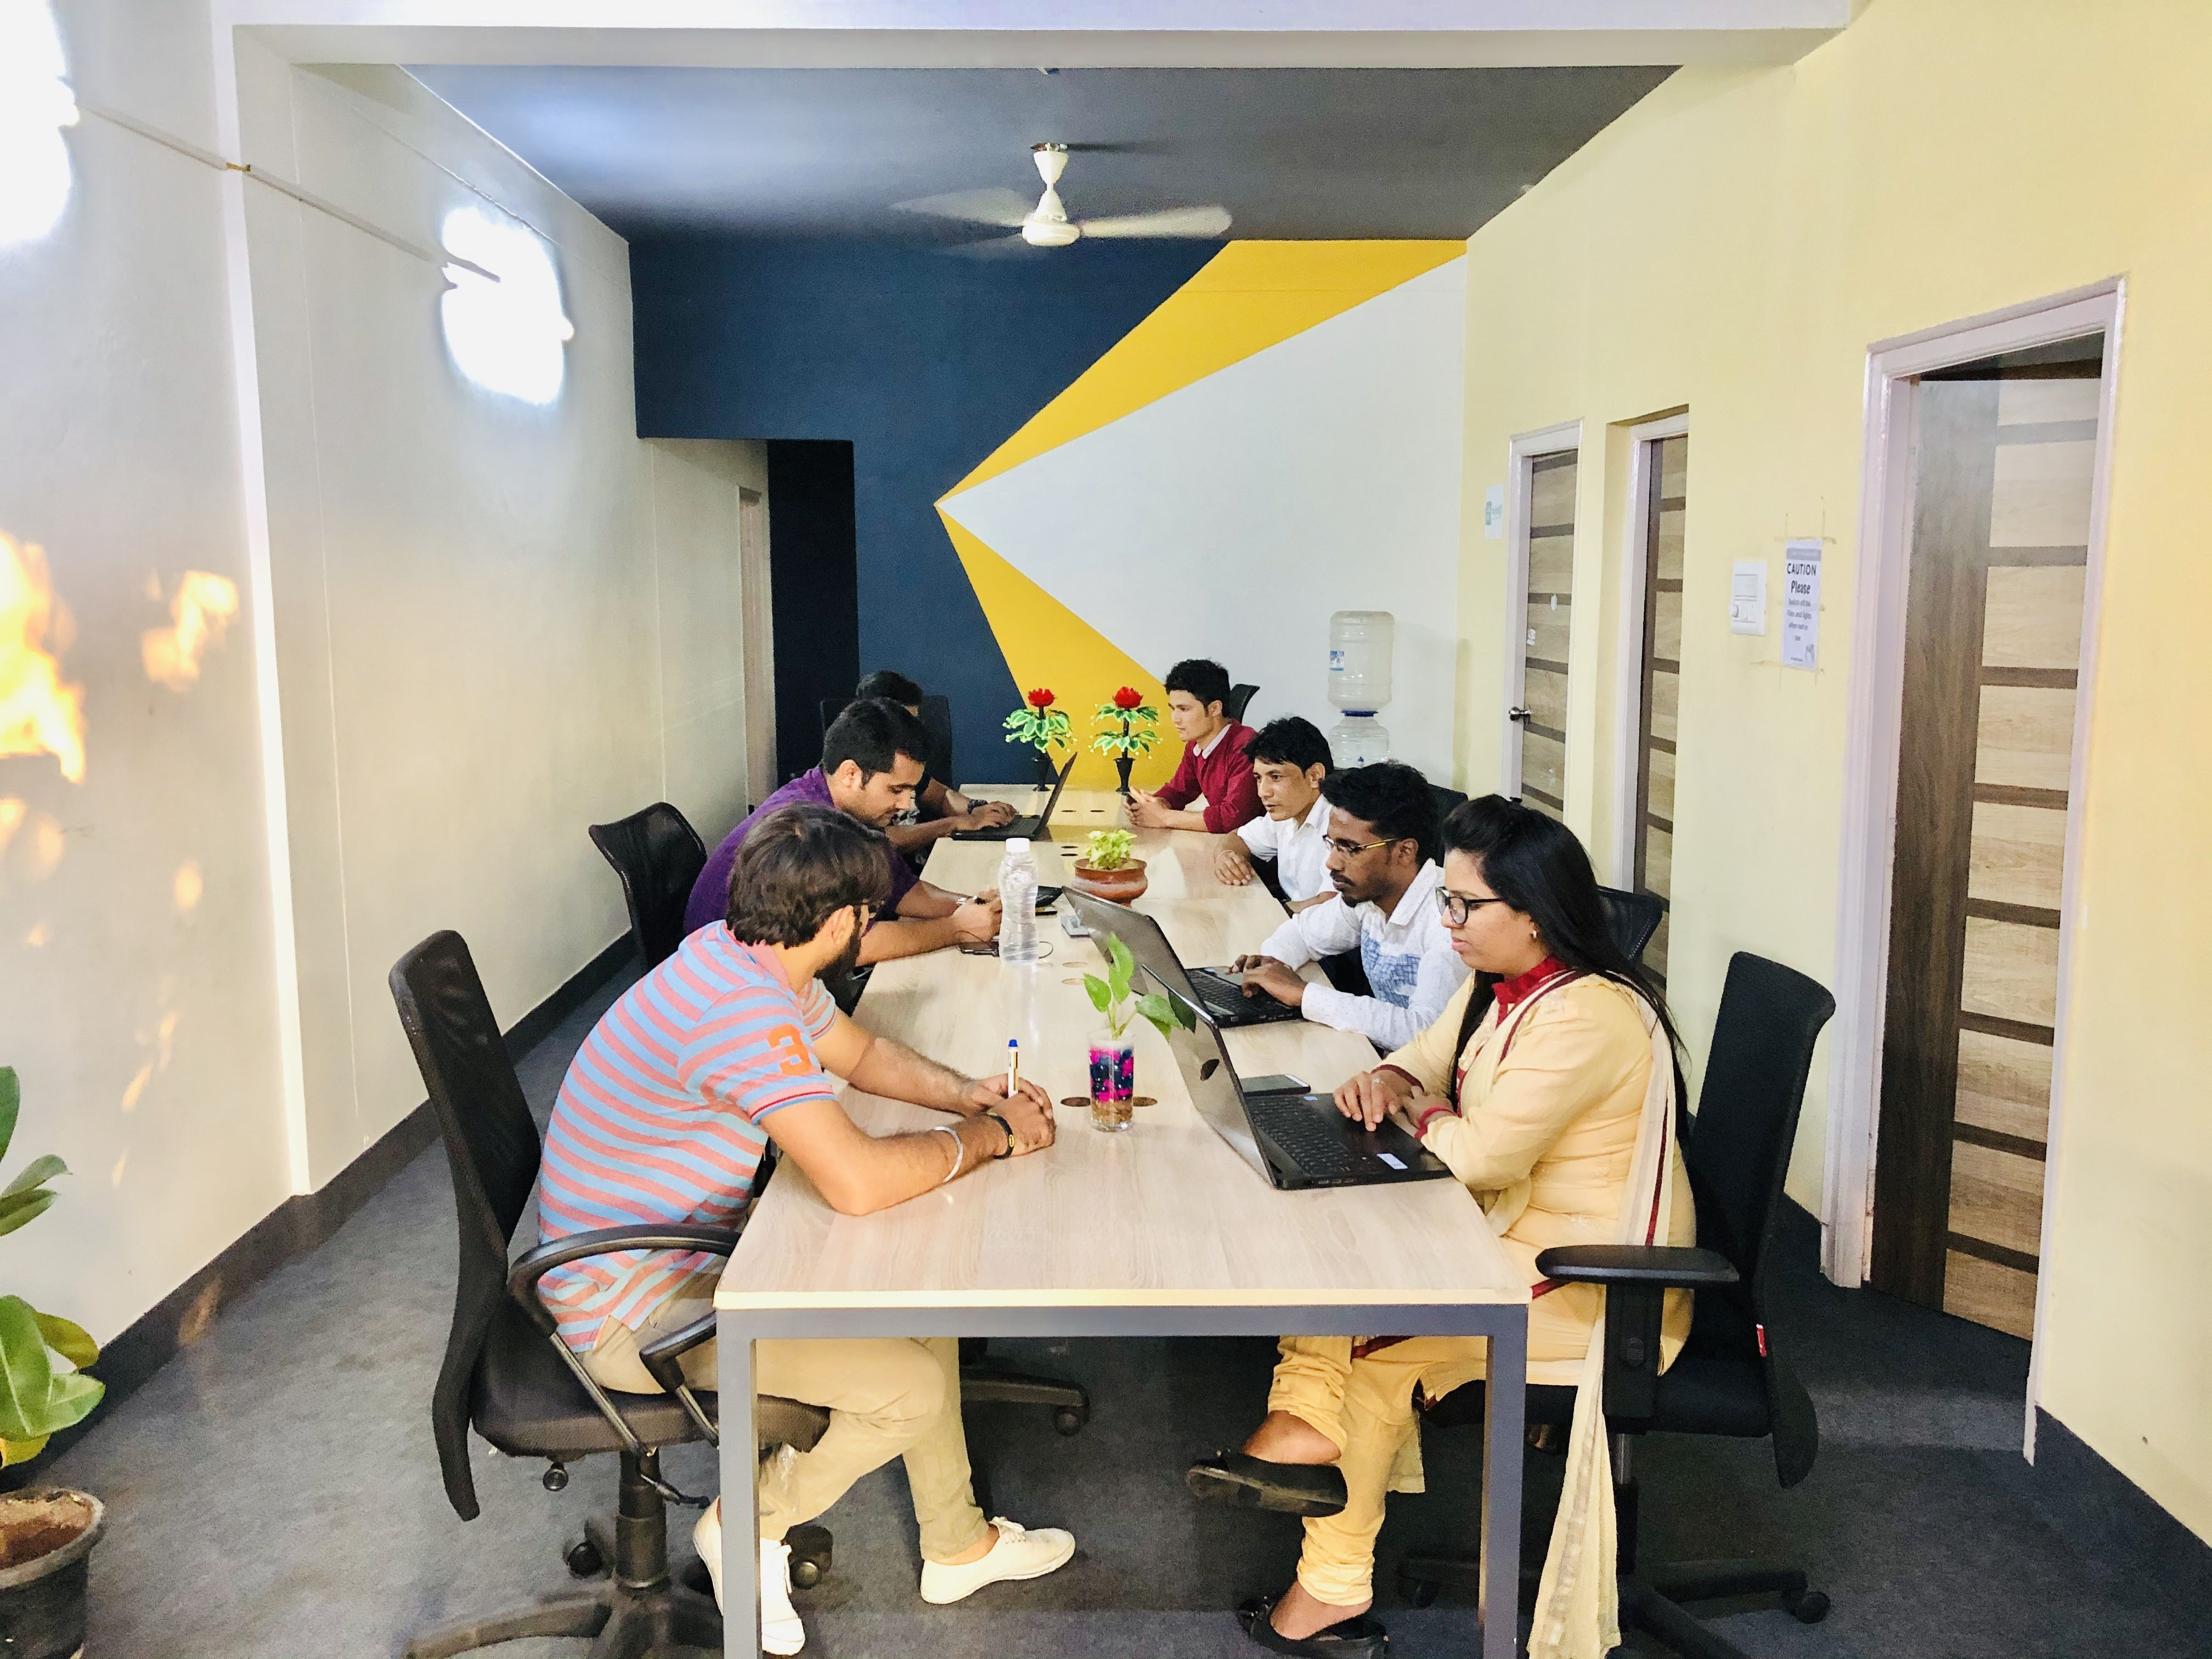 Office For Rent In Indiranagar Bengaluru 9739966778 Bengaluru